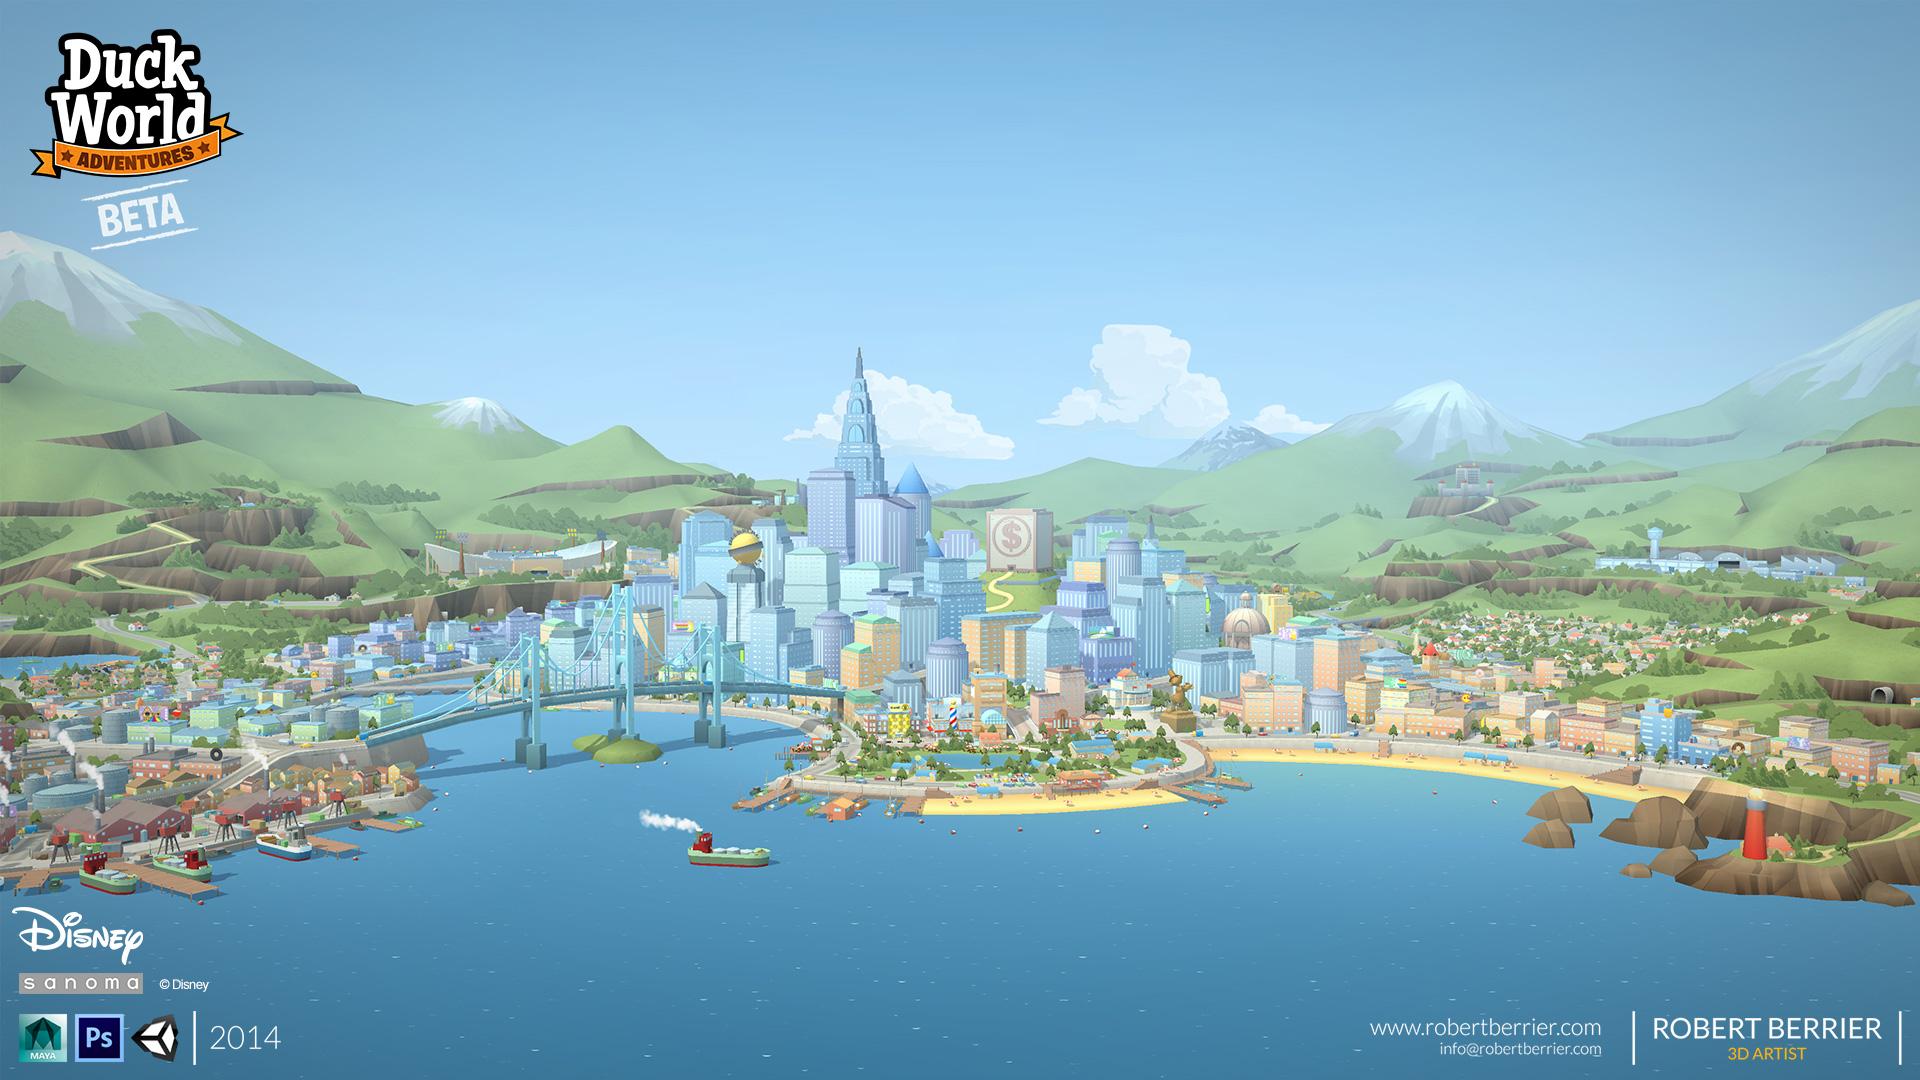 Robert Berrier - Disney - Duck World - Hub